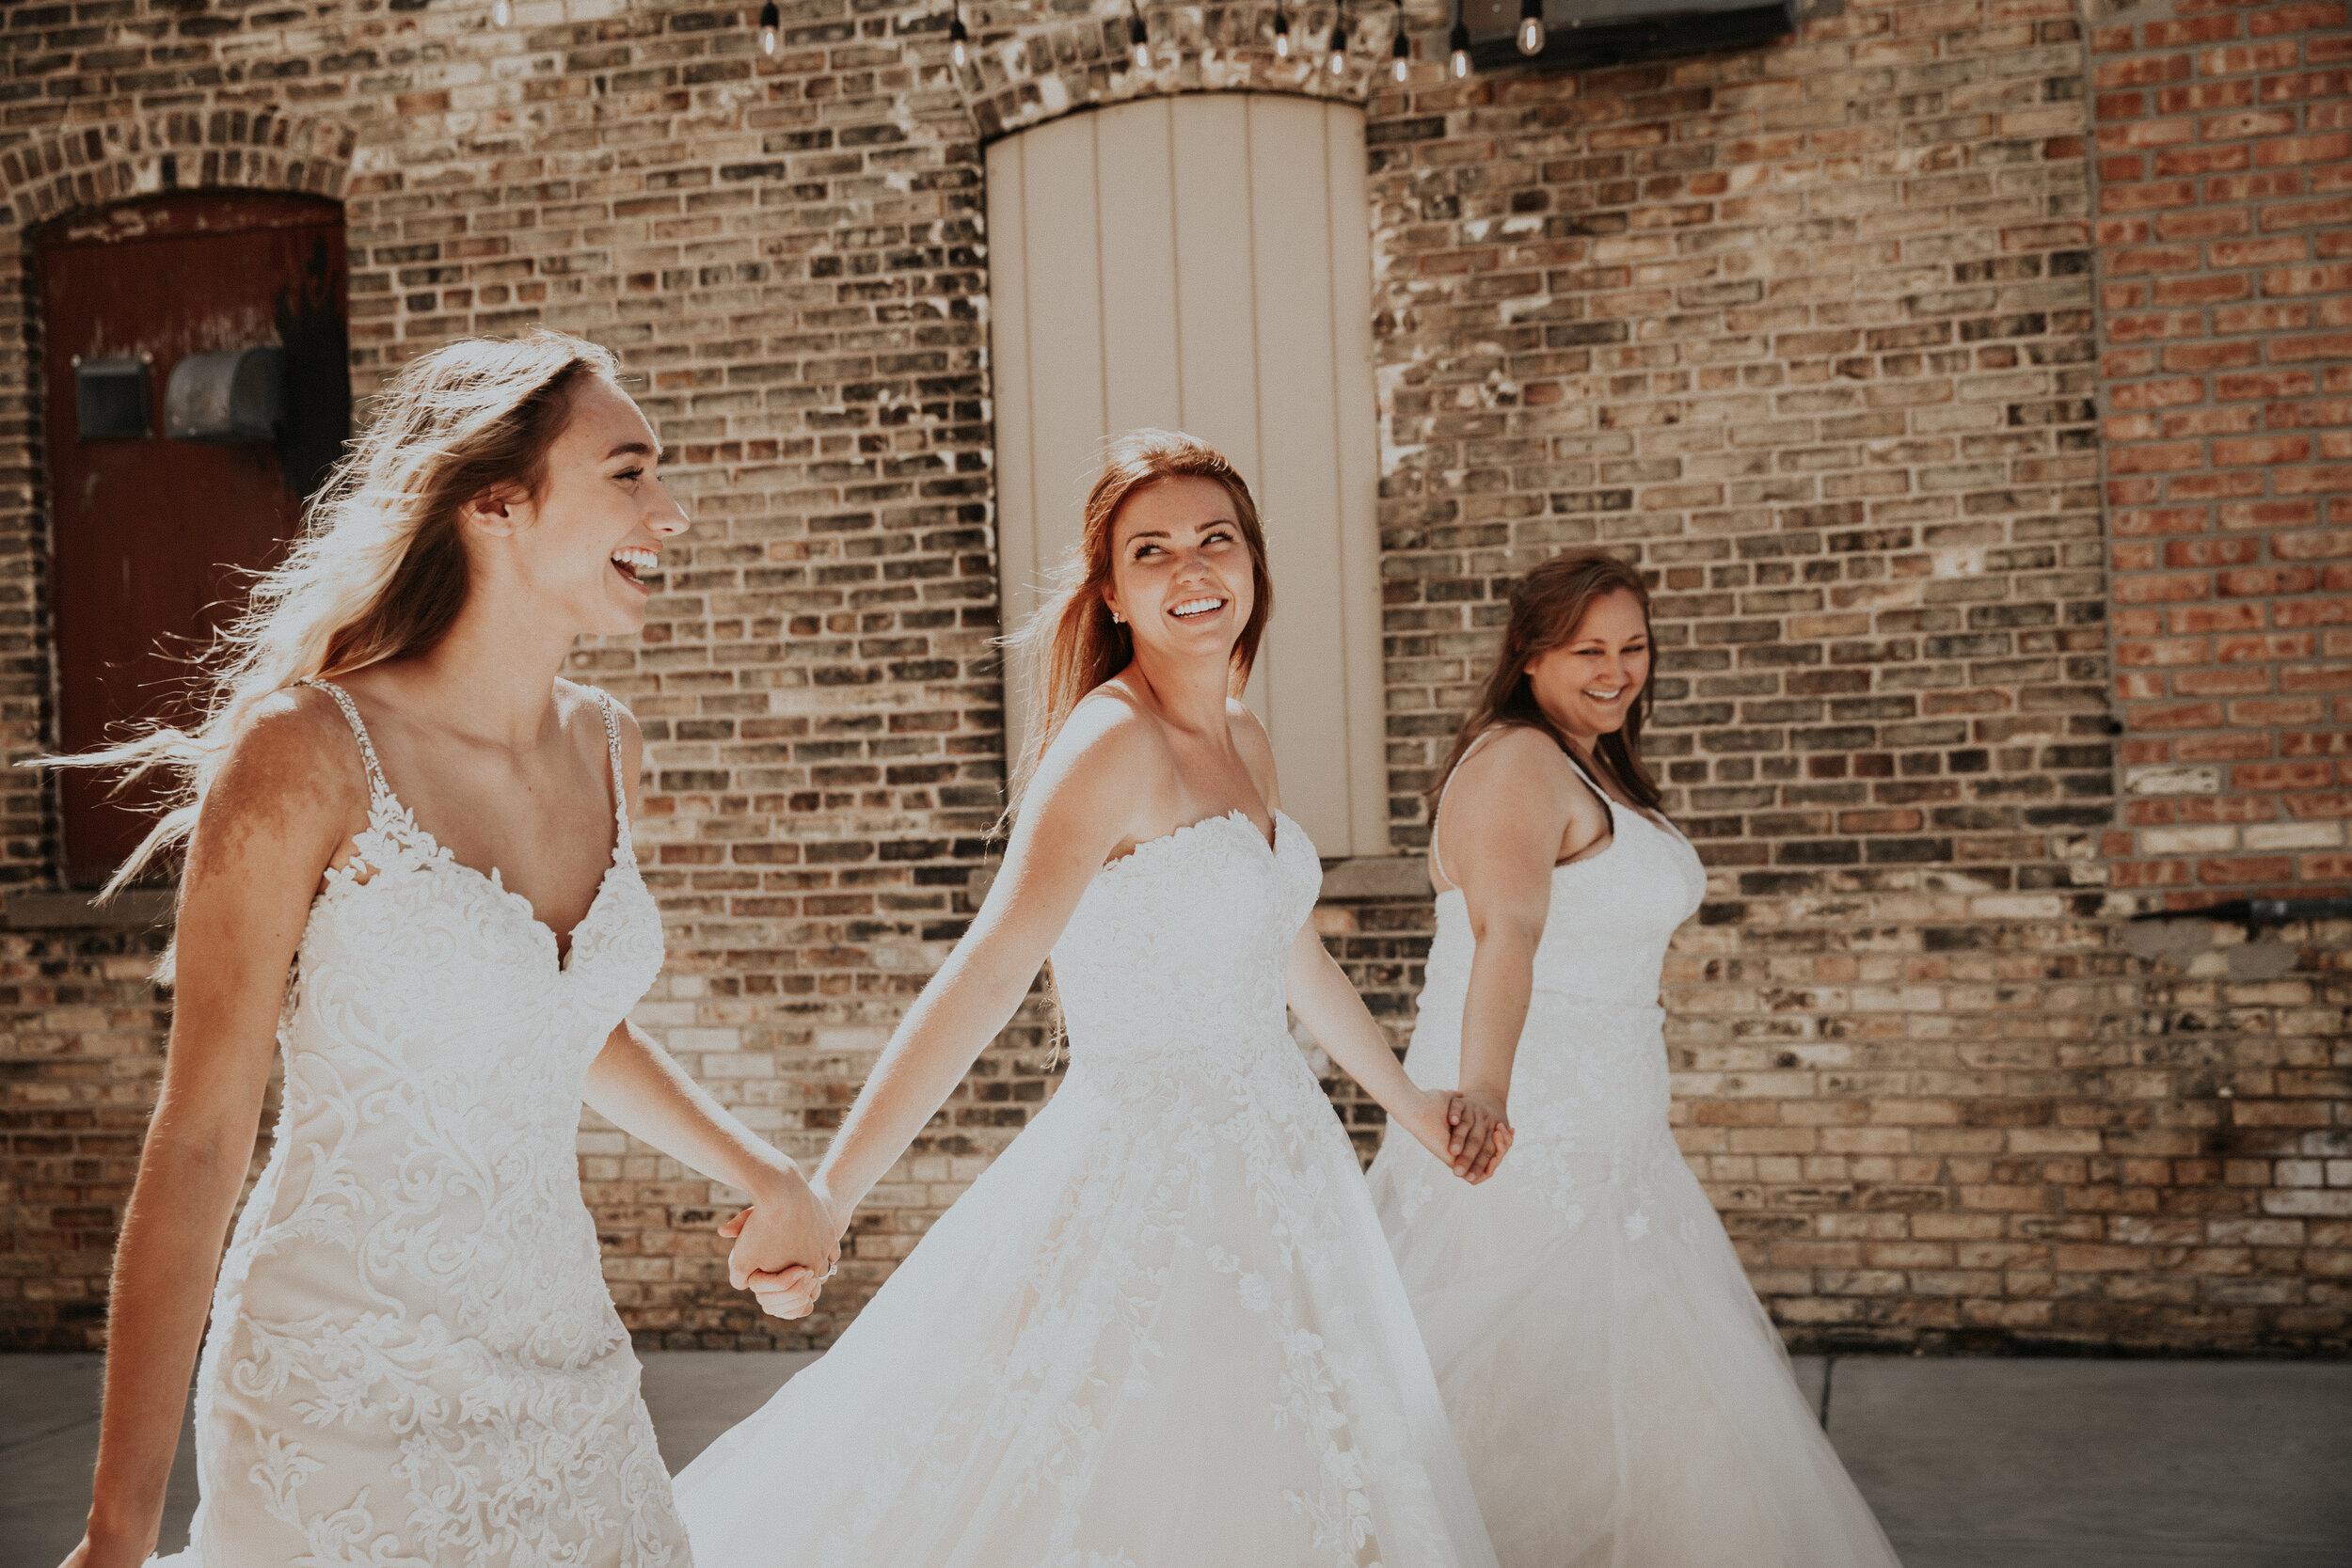 3 brides.jpg